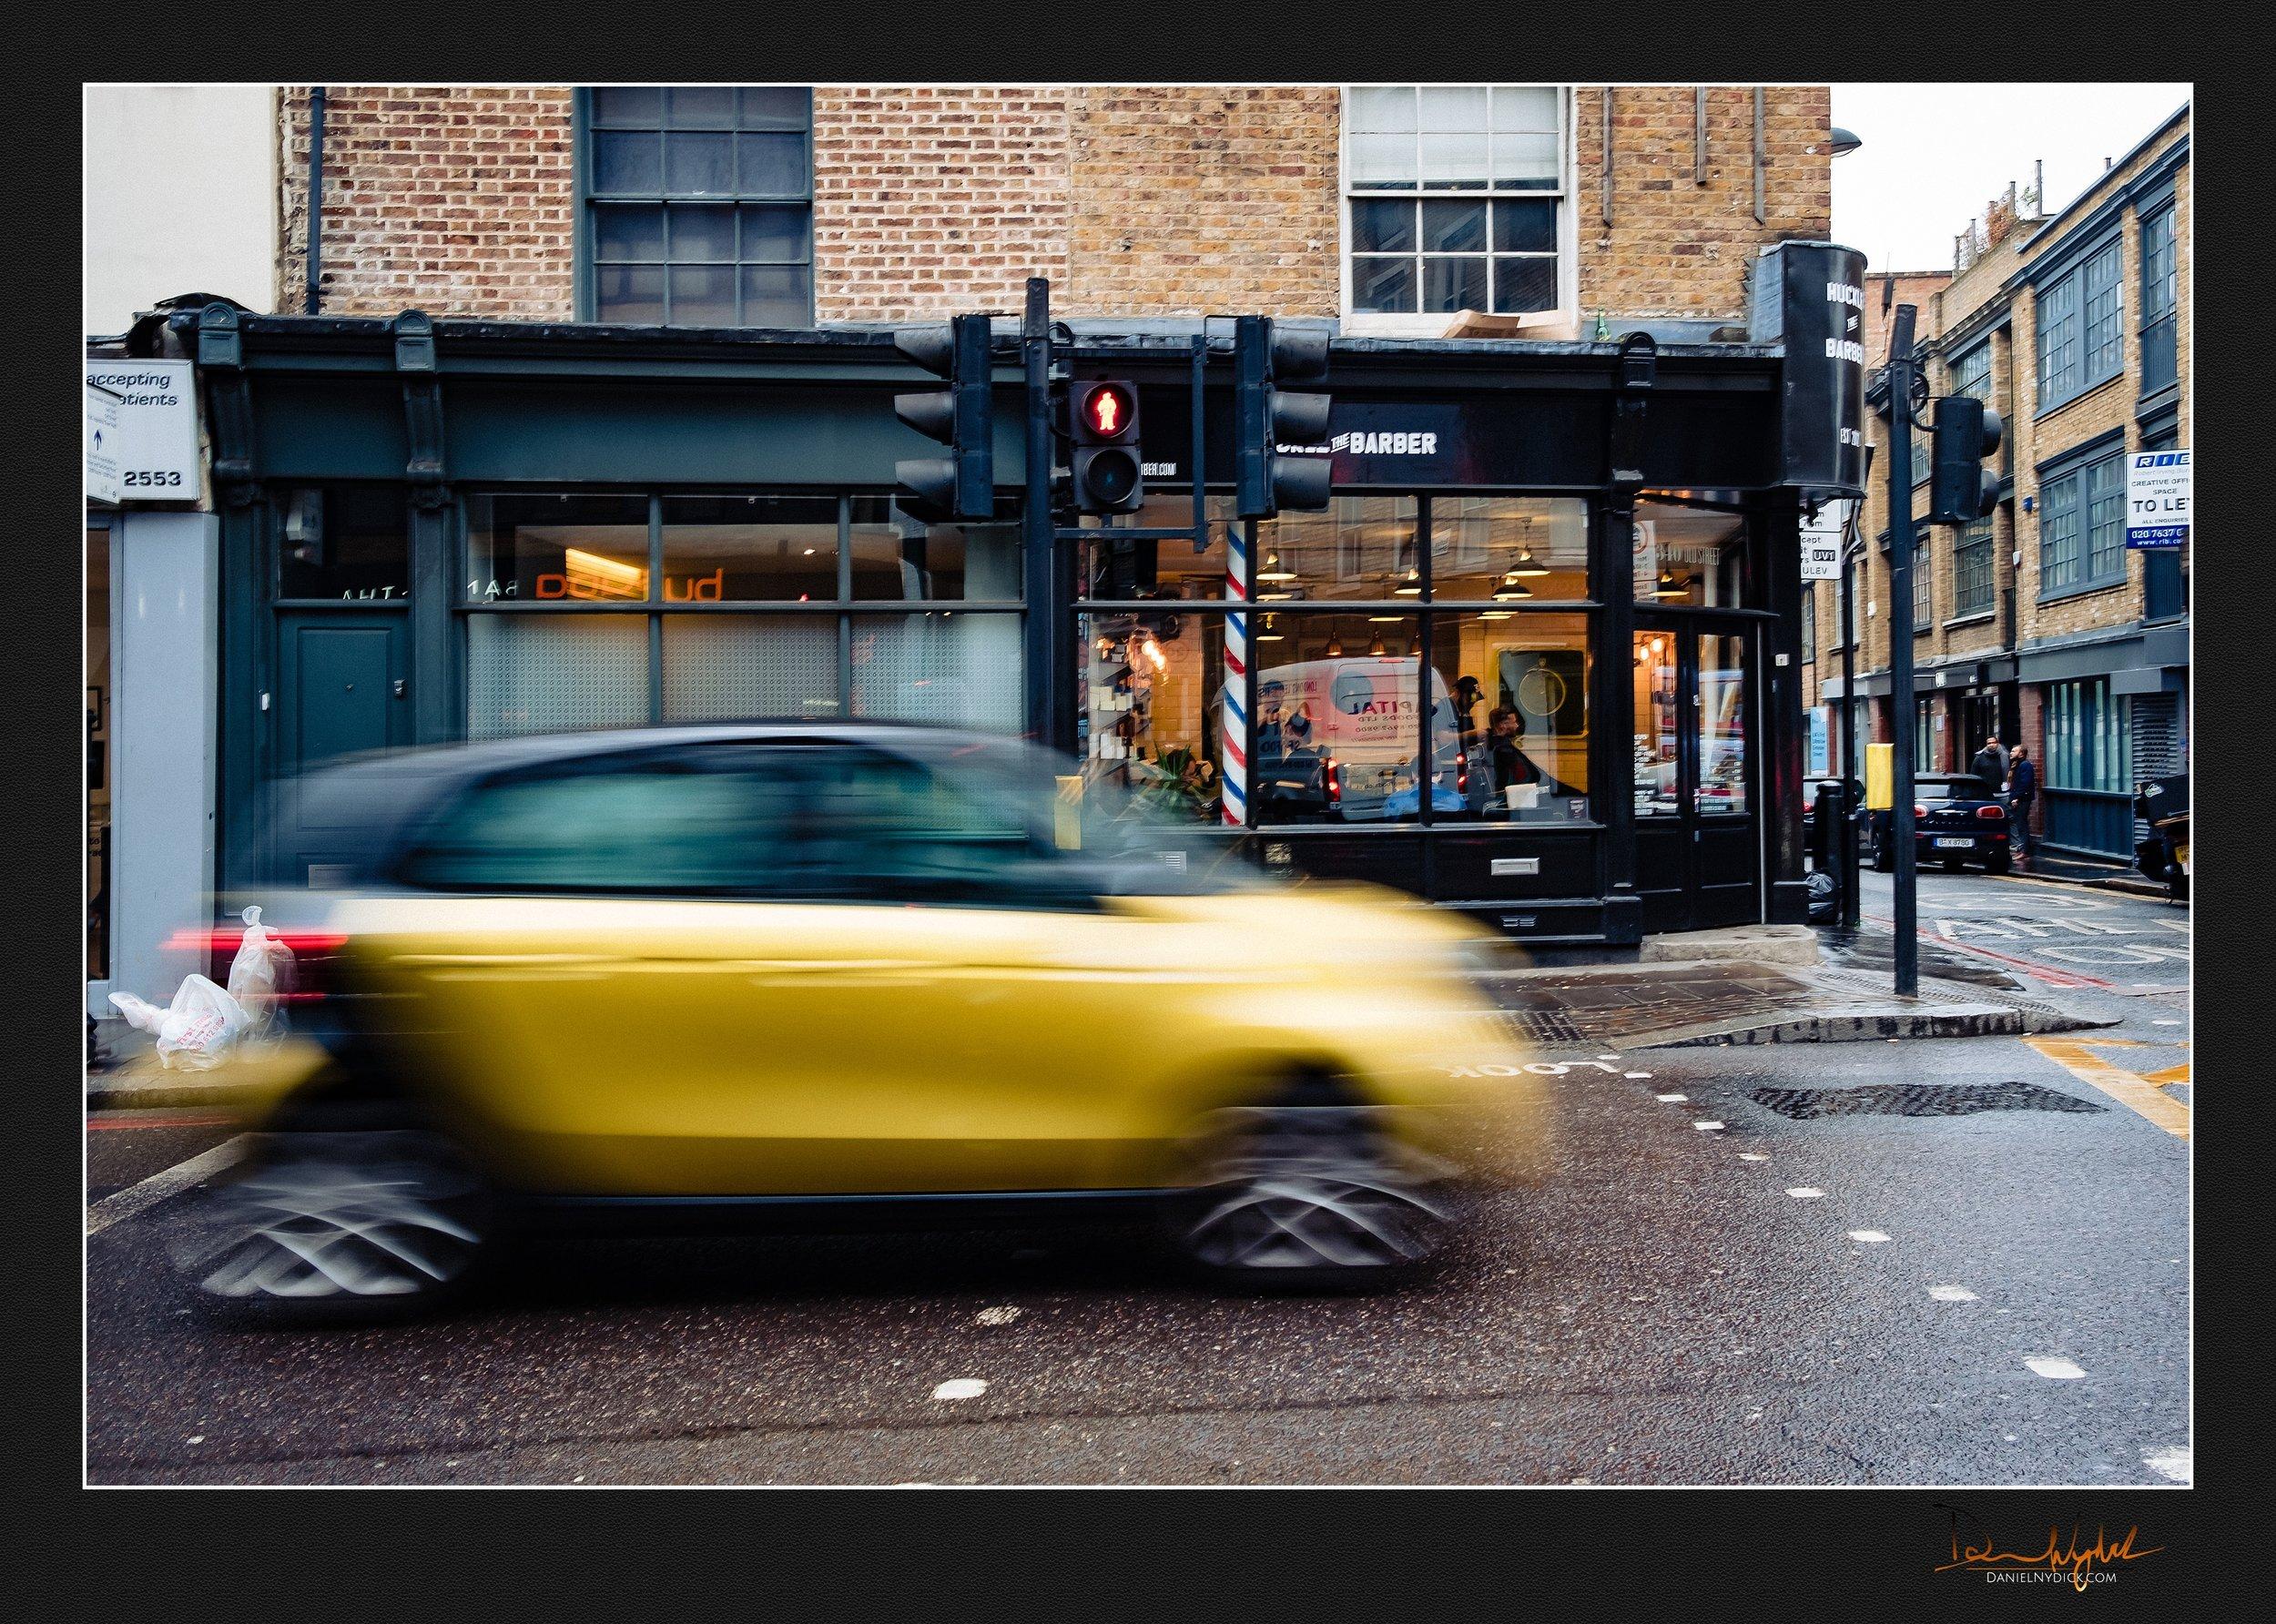 slow shutter, shutter drag, shoreditch, car, people, street